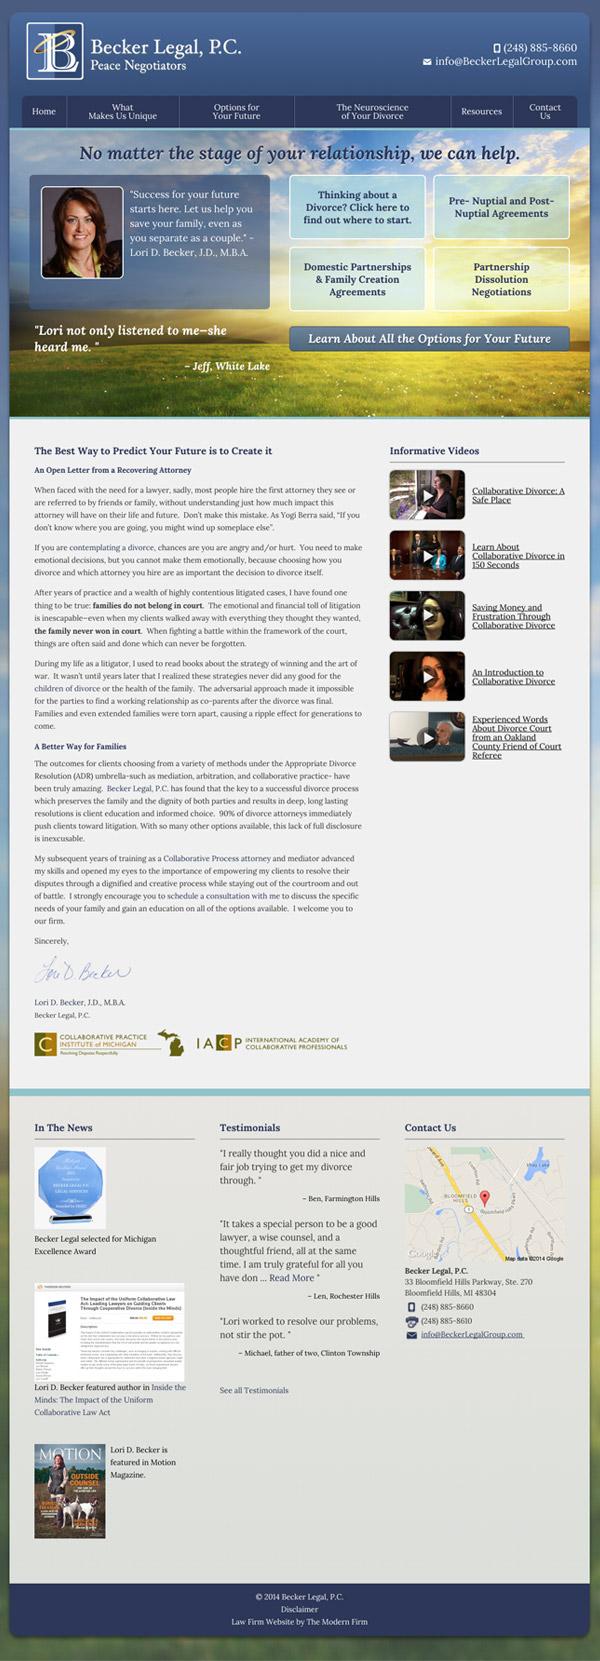 Law Firm Website Design for Becker Legal, P.C.